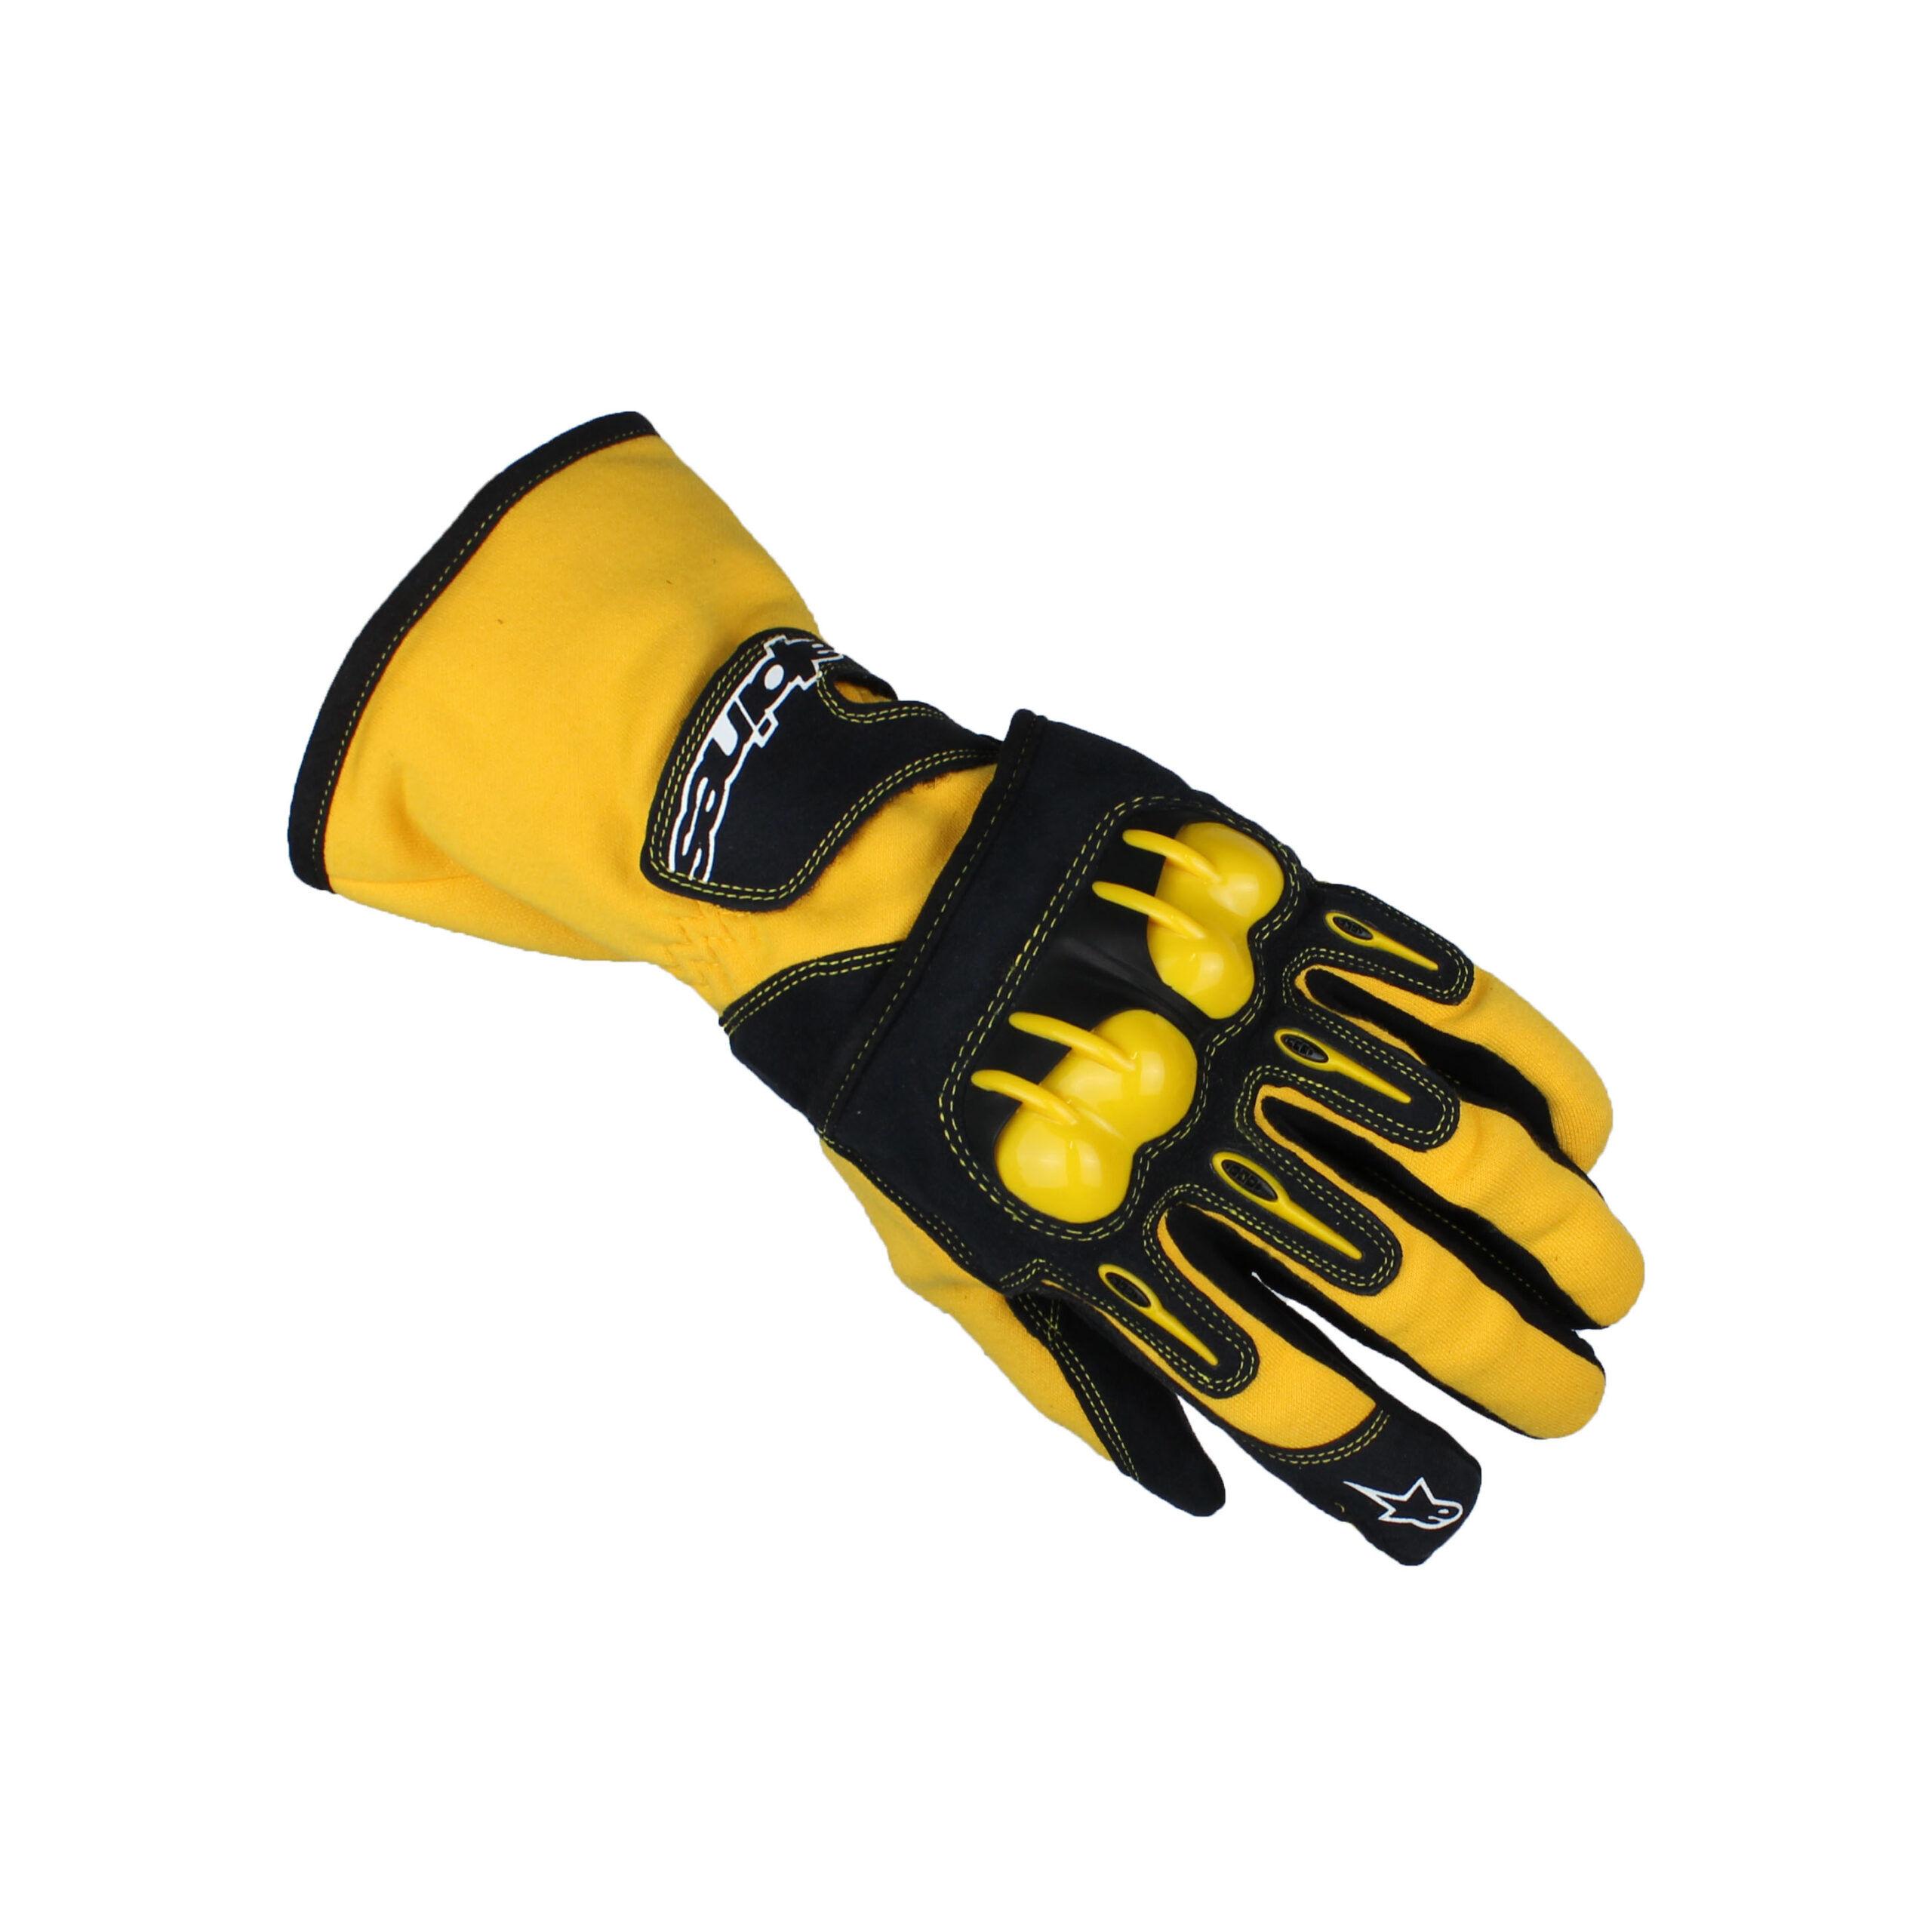 Alpinestars TECH 1-KV Race Gloves Yellow